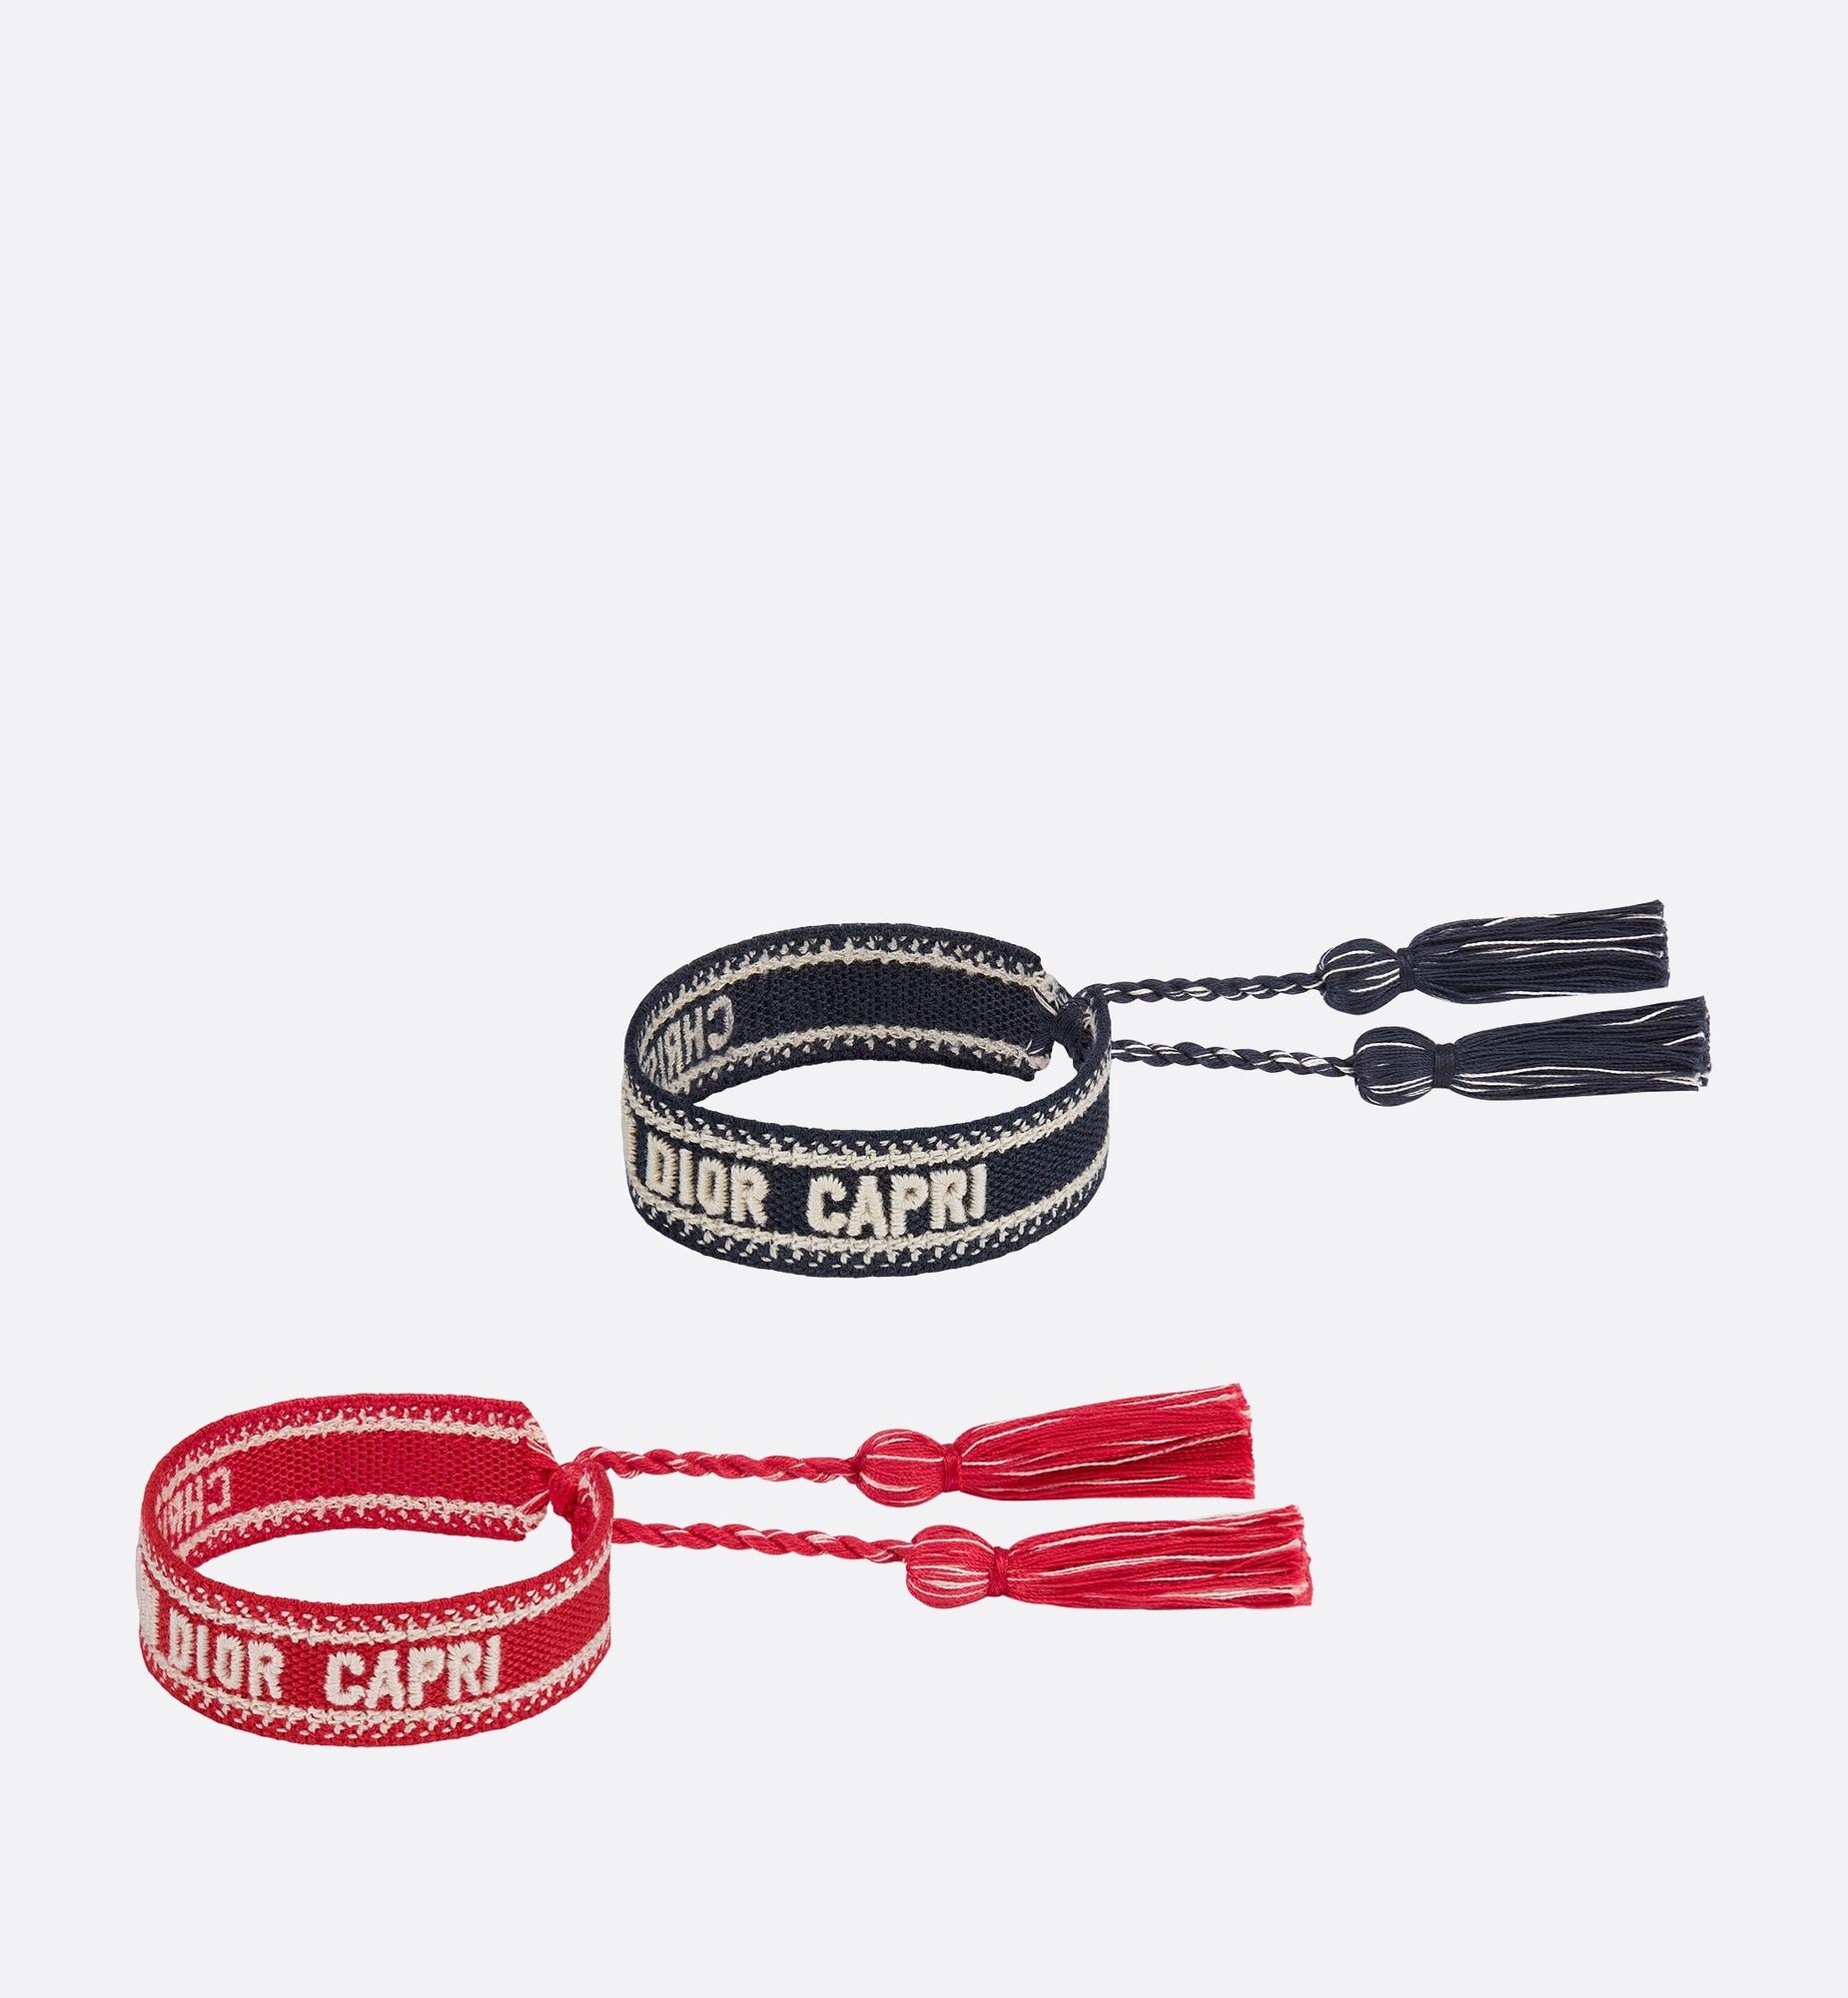 J'Adior 'CAPRI' Bracelet Set Profile view